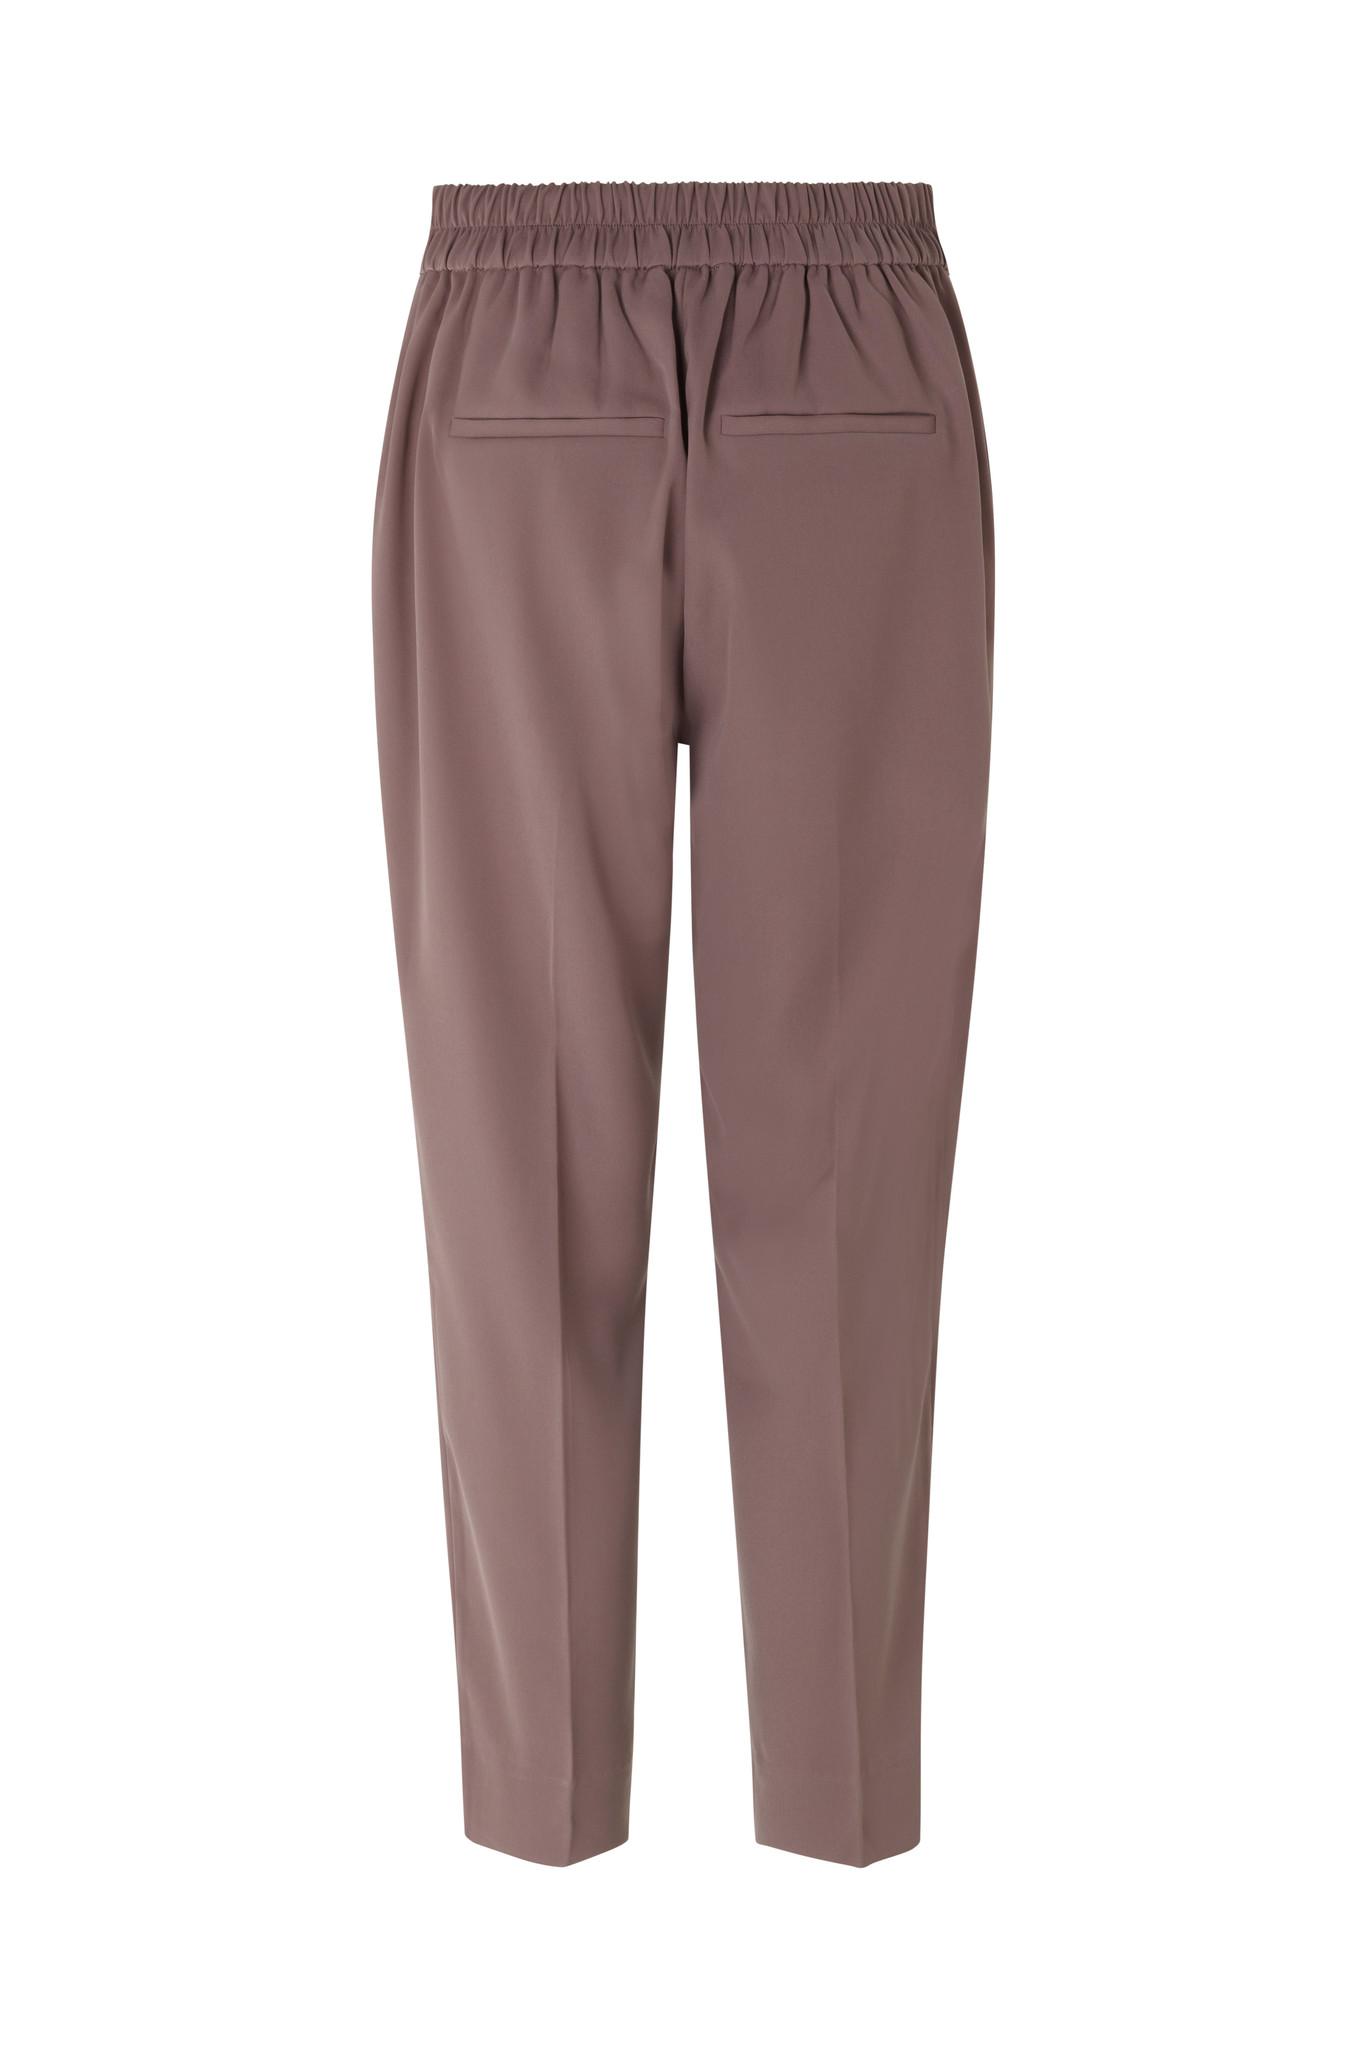 Garbo Trousers - Peppercorn-3